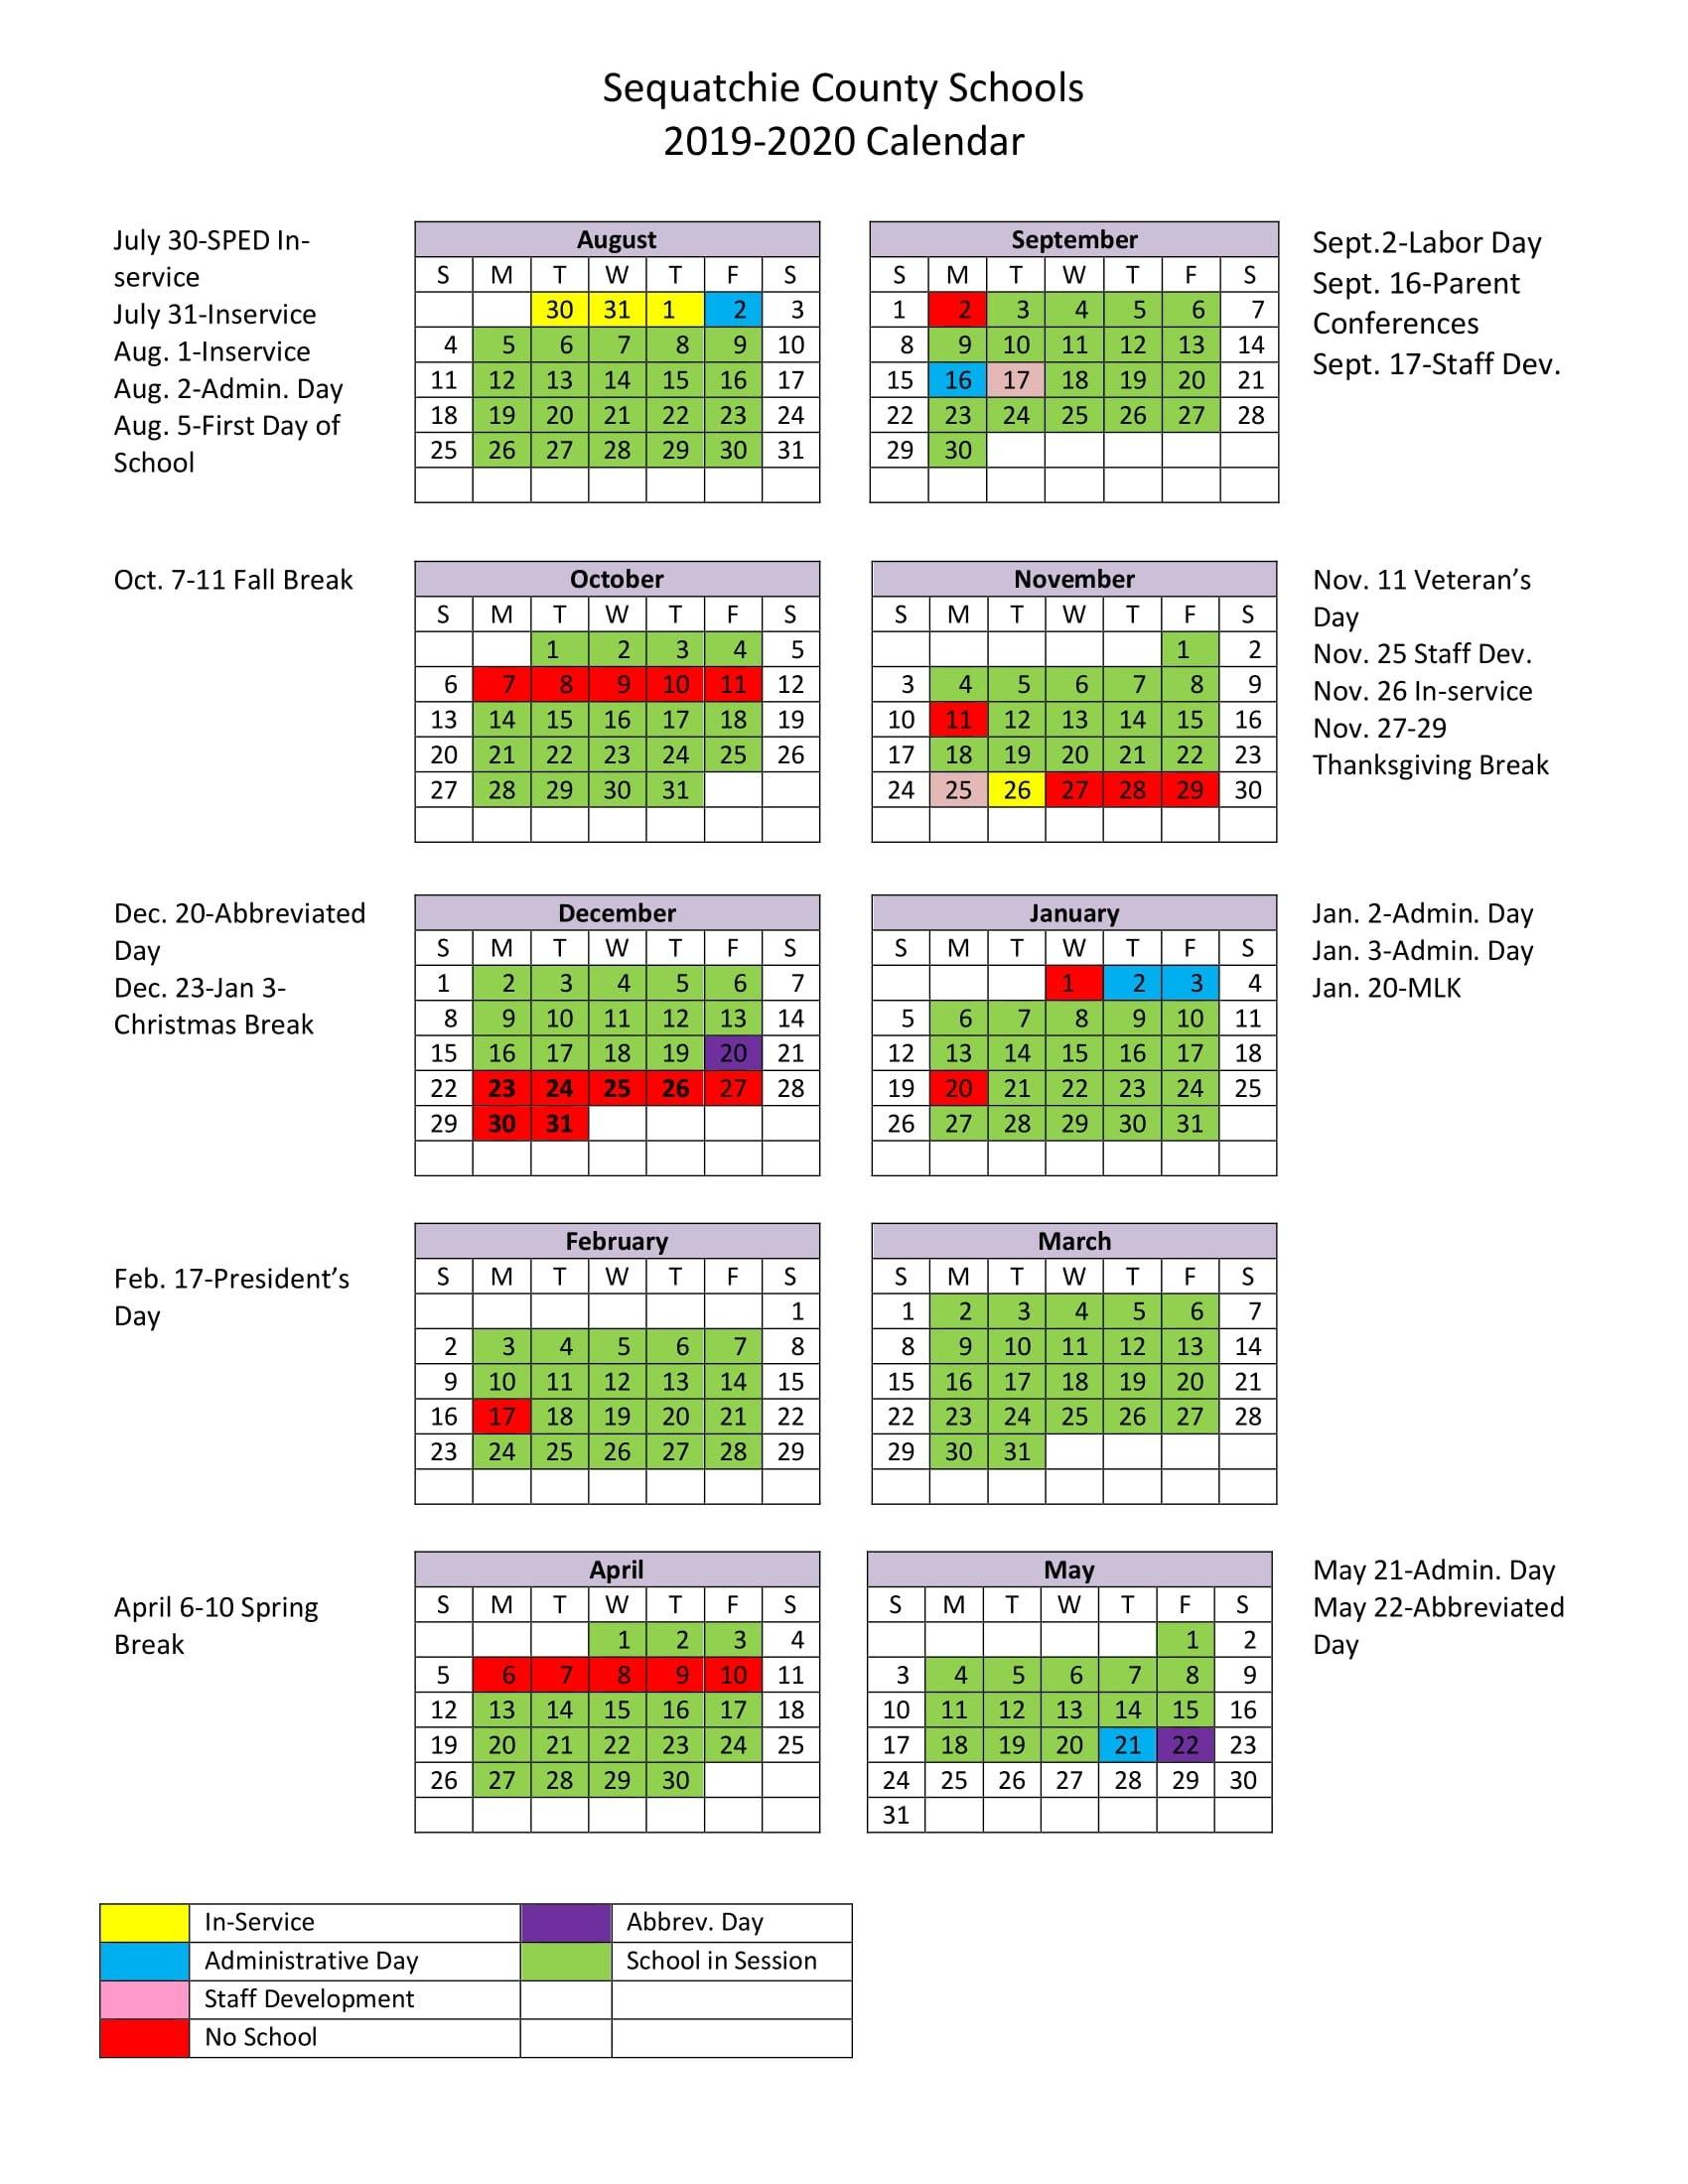 2018-19 School Calendar Calendar 2019 School